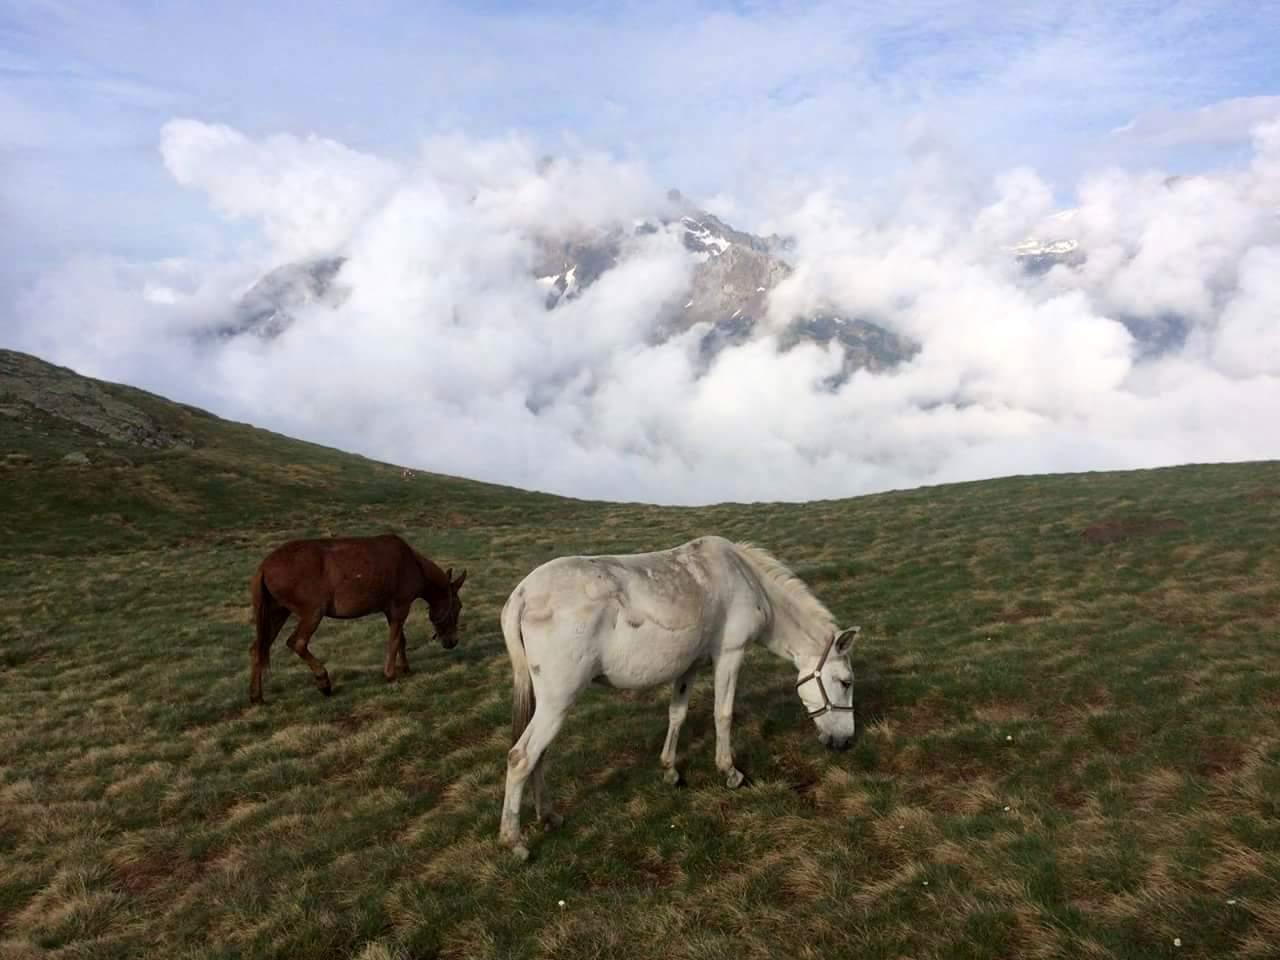 IMG 20160613 WA0003 - Porteo de avituallamientos, Trekking Mule.